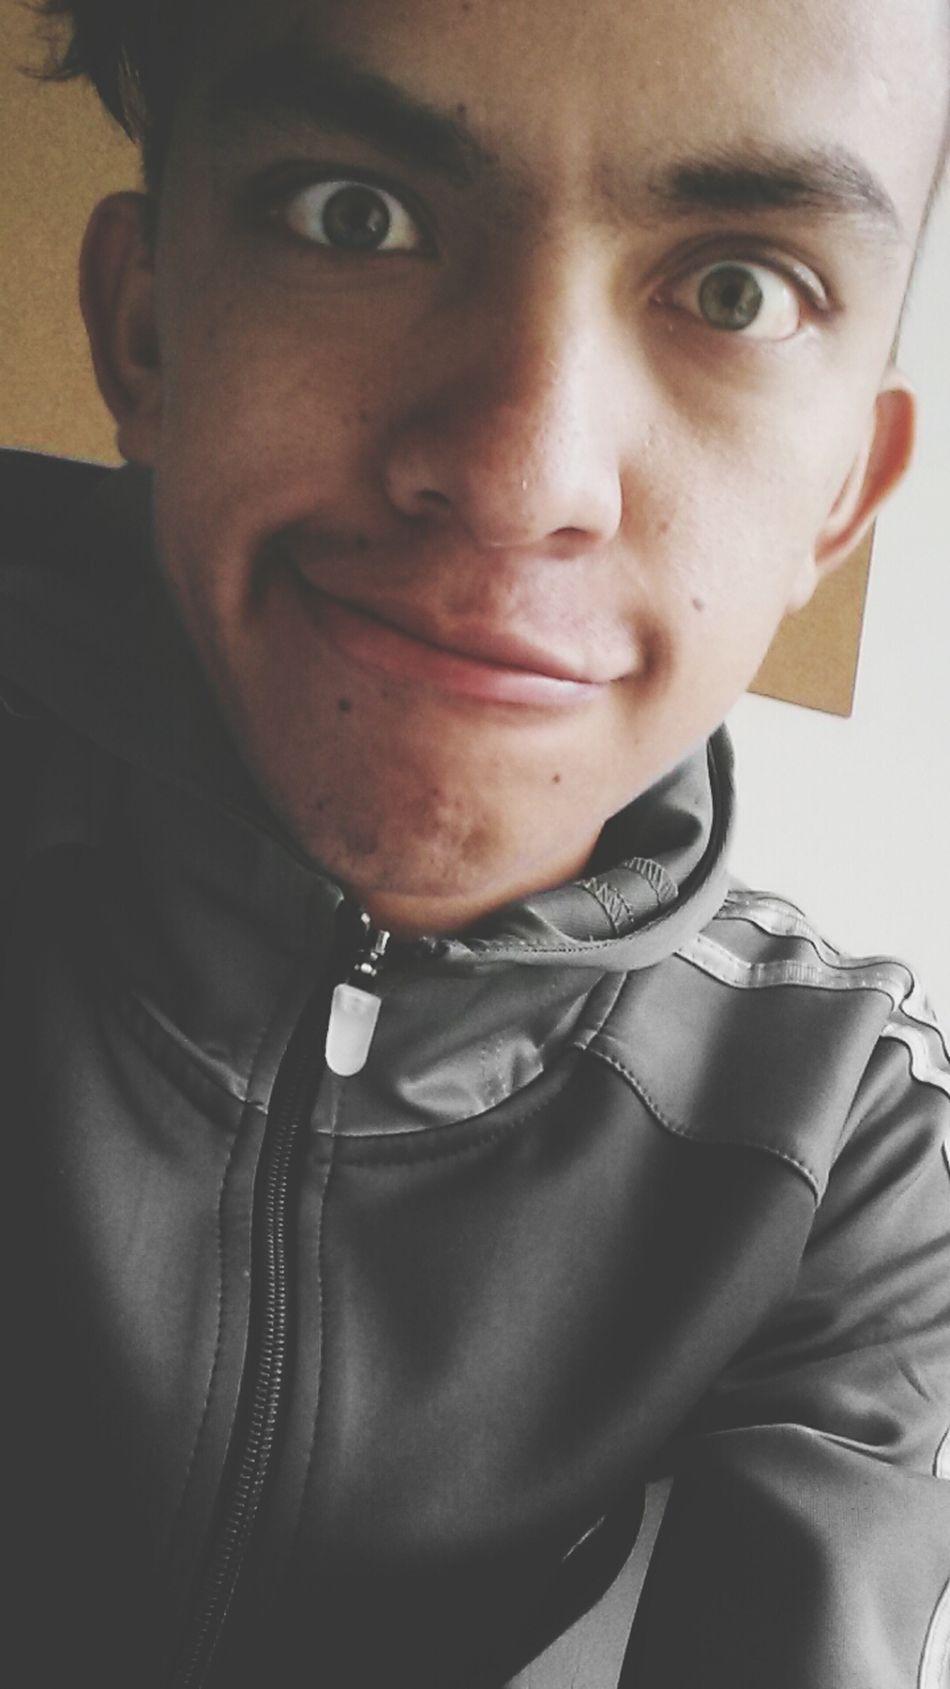 Selfie :) First Eyeem Photo